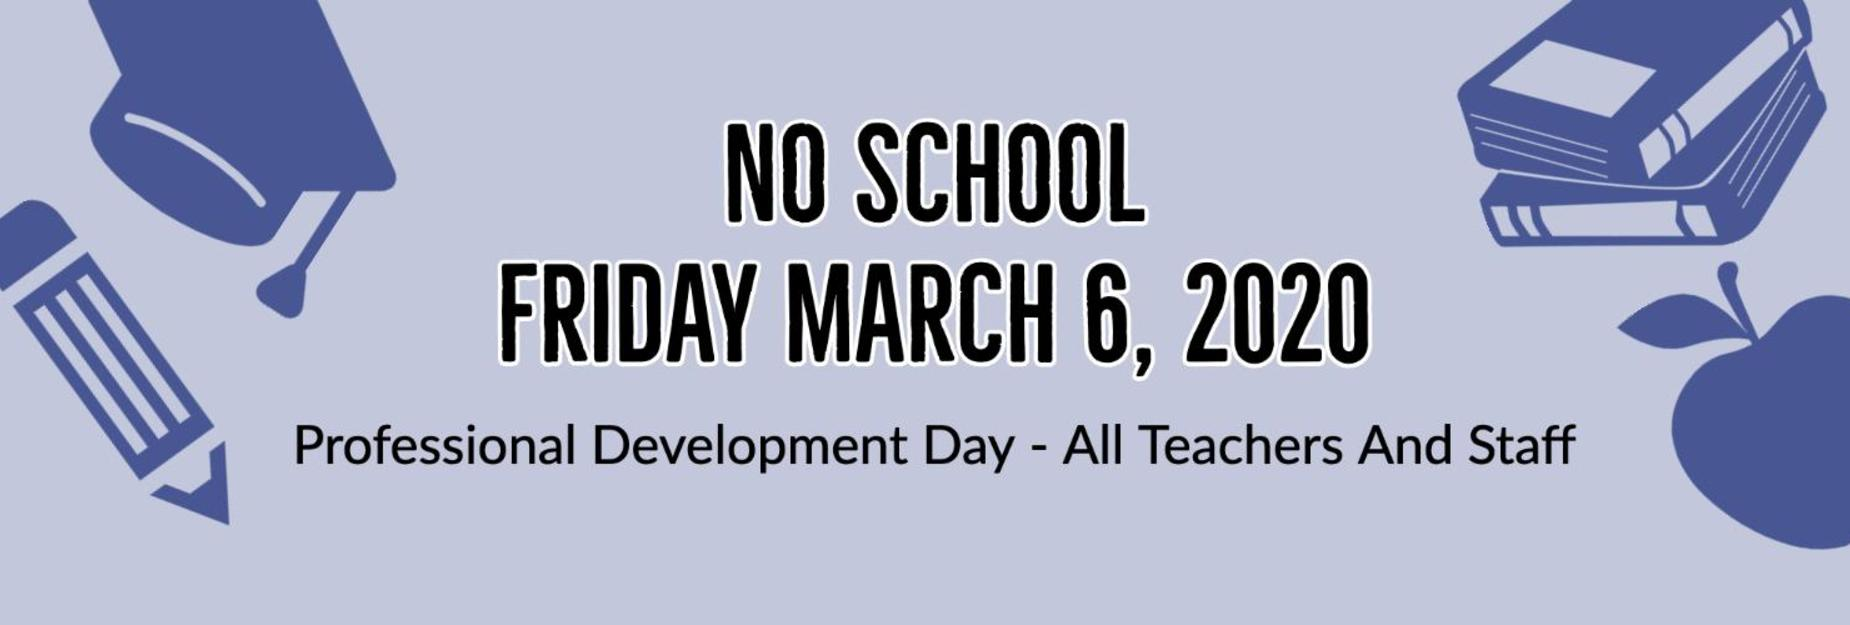 Professional Development Day March 6 2020